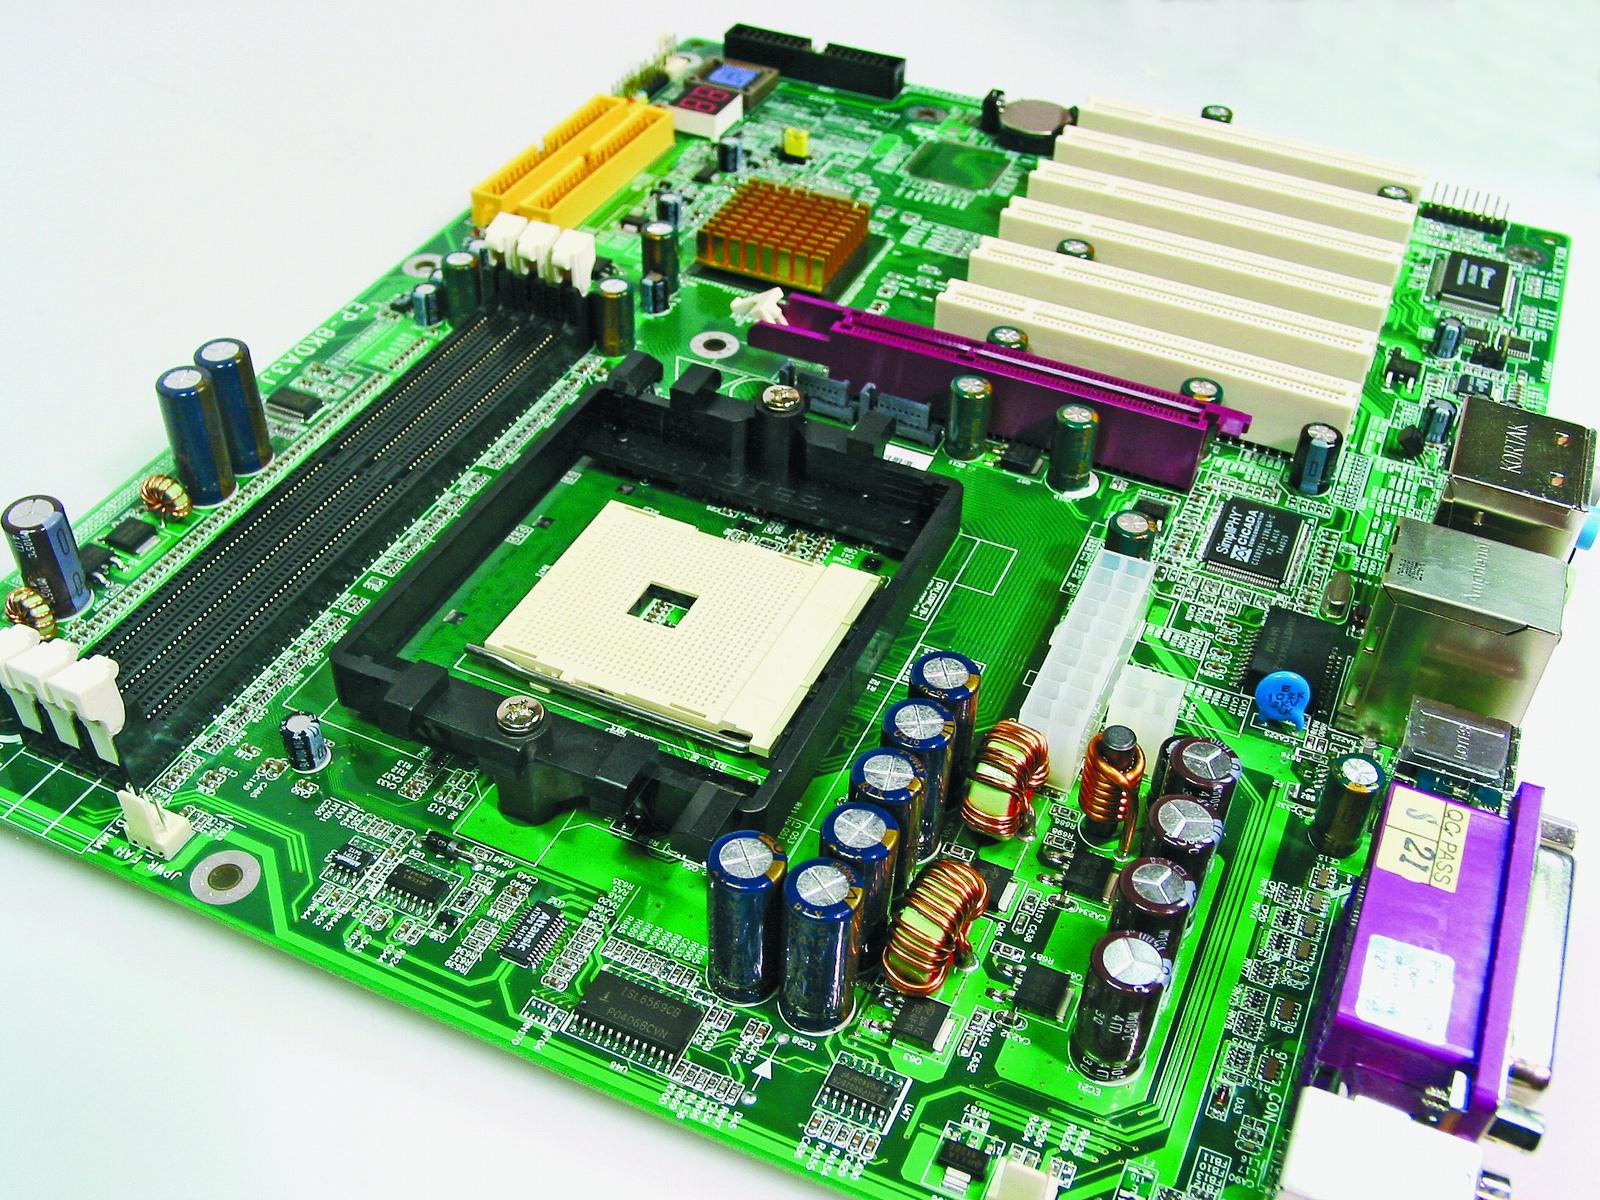 Intel i845ge